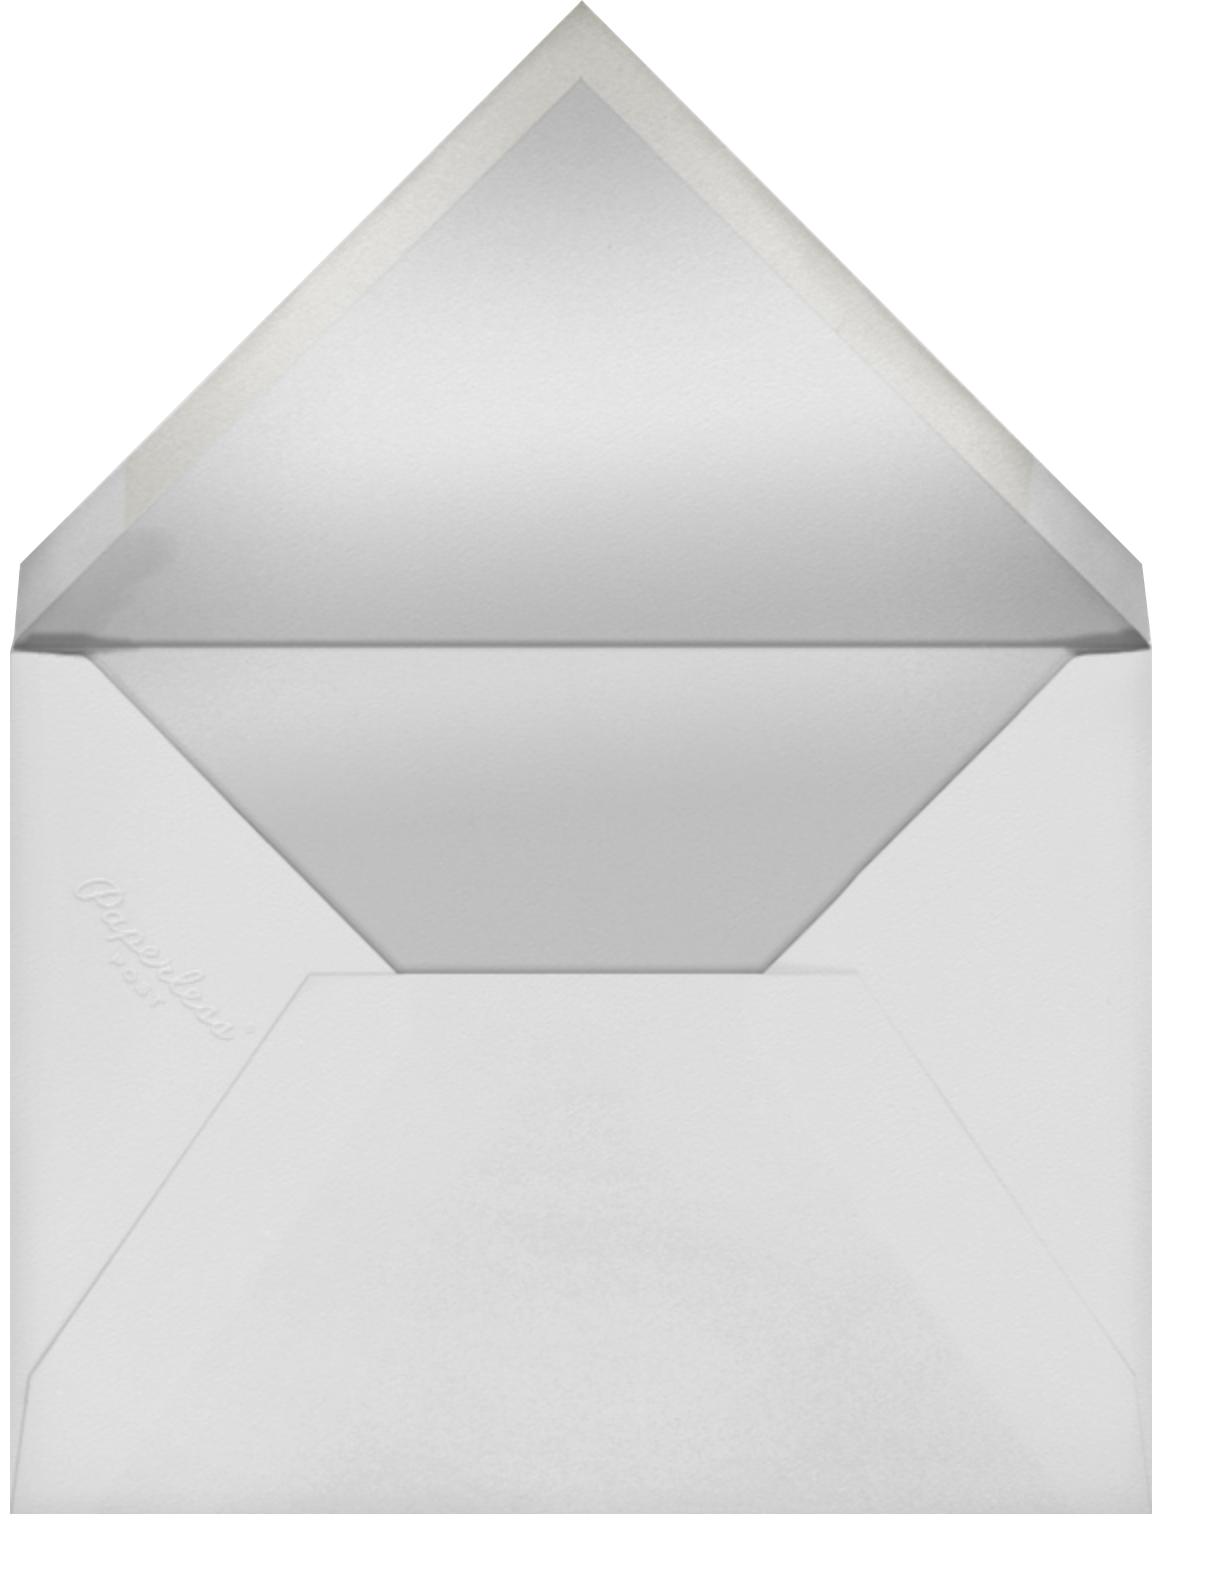 Josephine Baker (Menu) - White/Gold - Paperless Post - Menus - envelope back